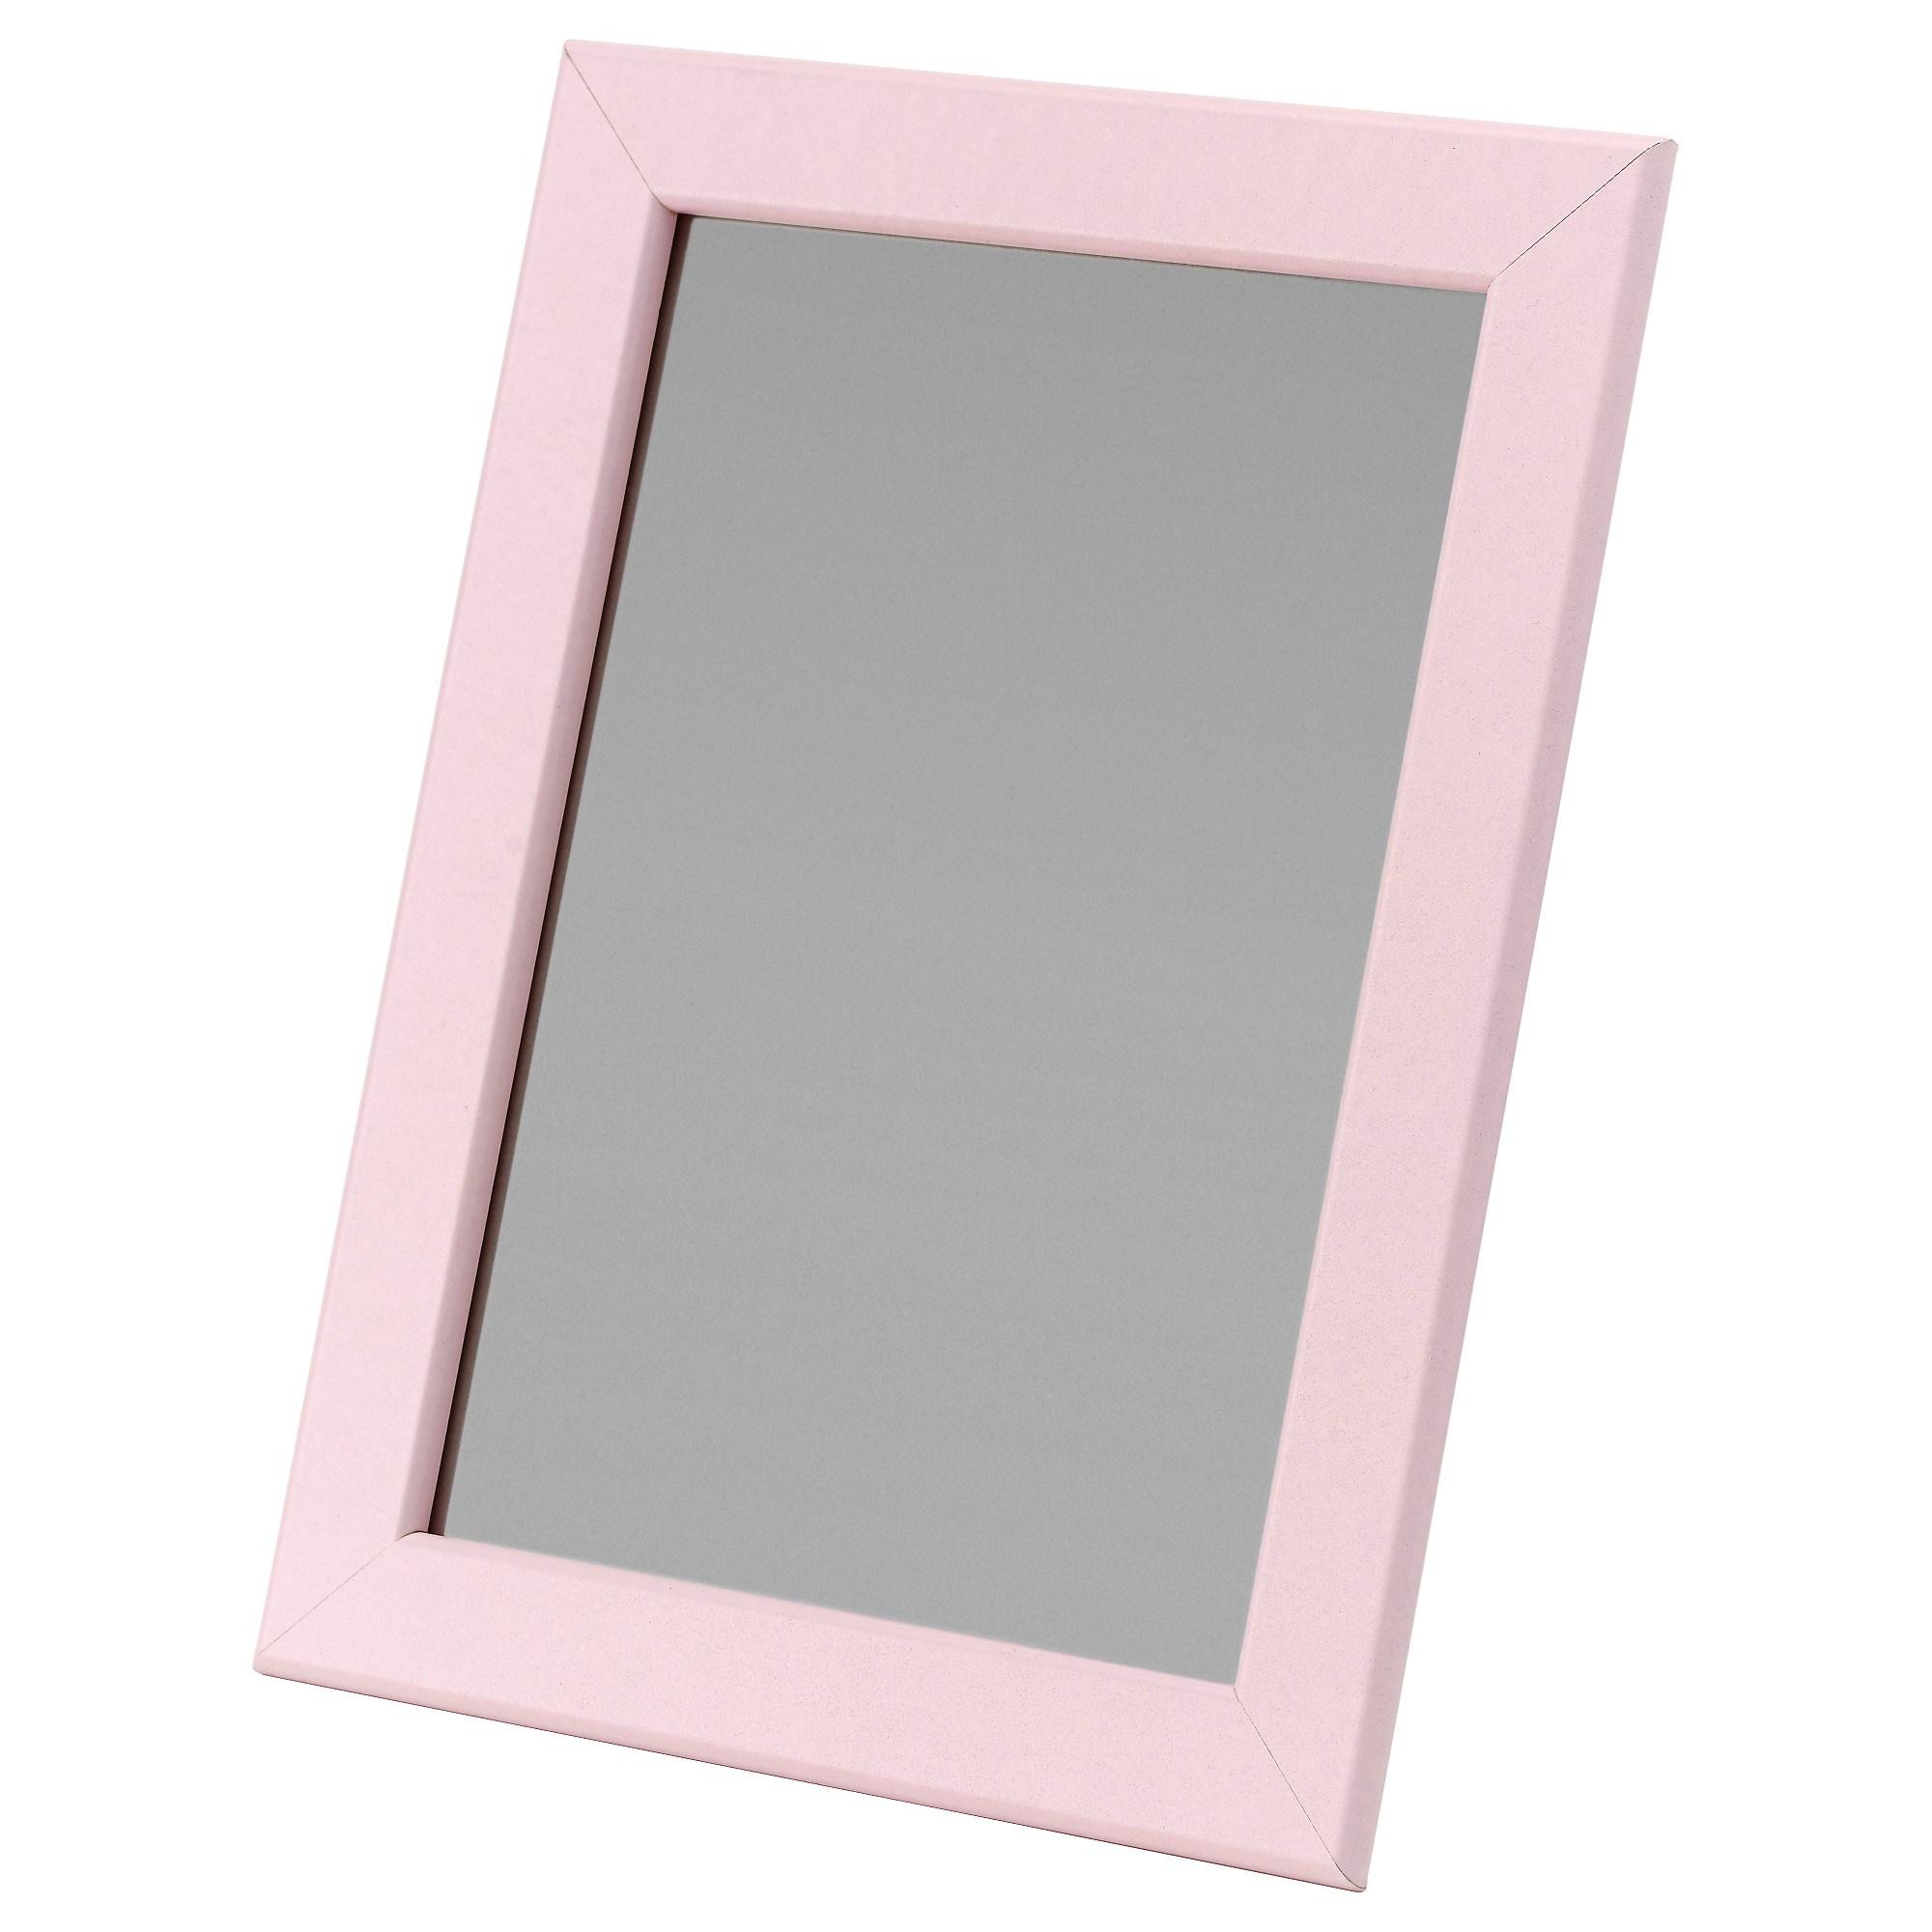 Fiskbo Photo Frame Pink 13×18 Cm Ikea Home Decoration